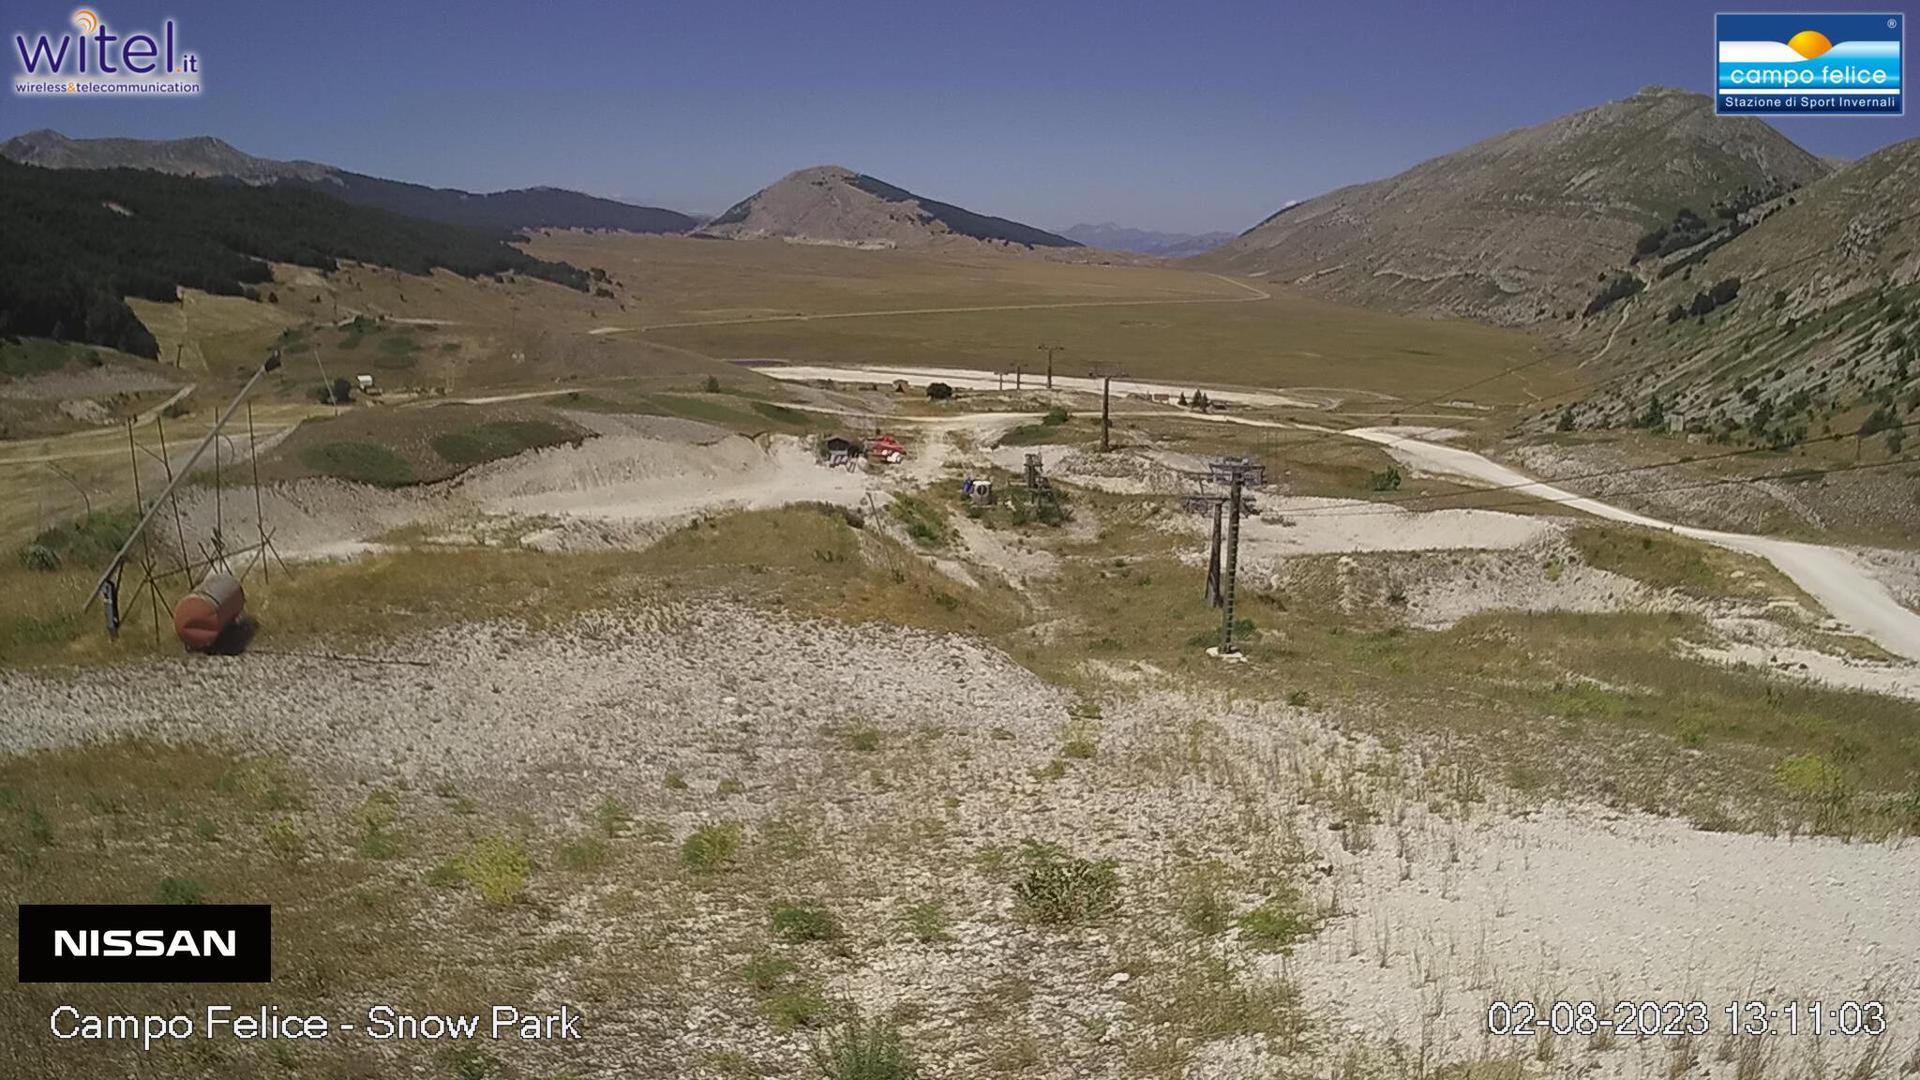 Webkamera Rocca di Cambio: Snowpark Campo Felice: Snowpark C